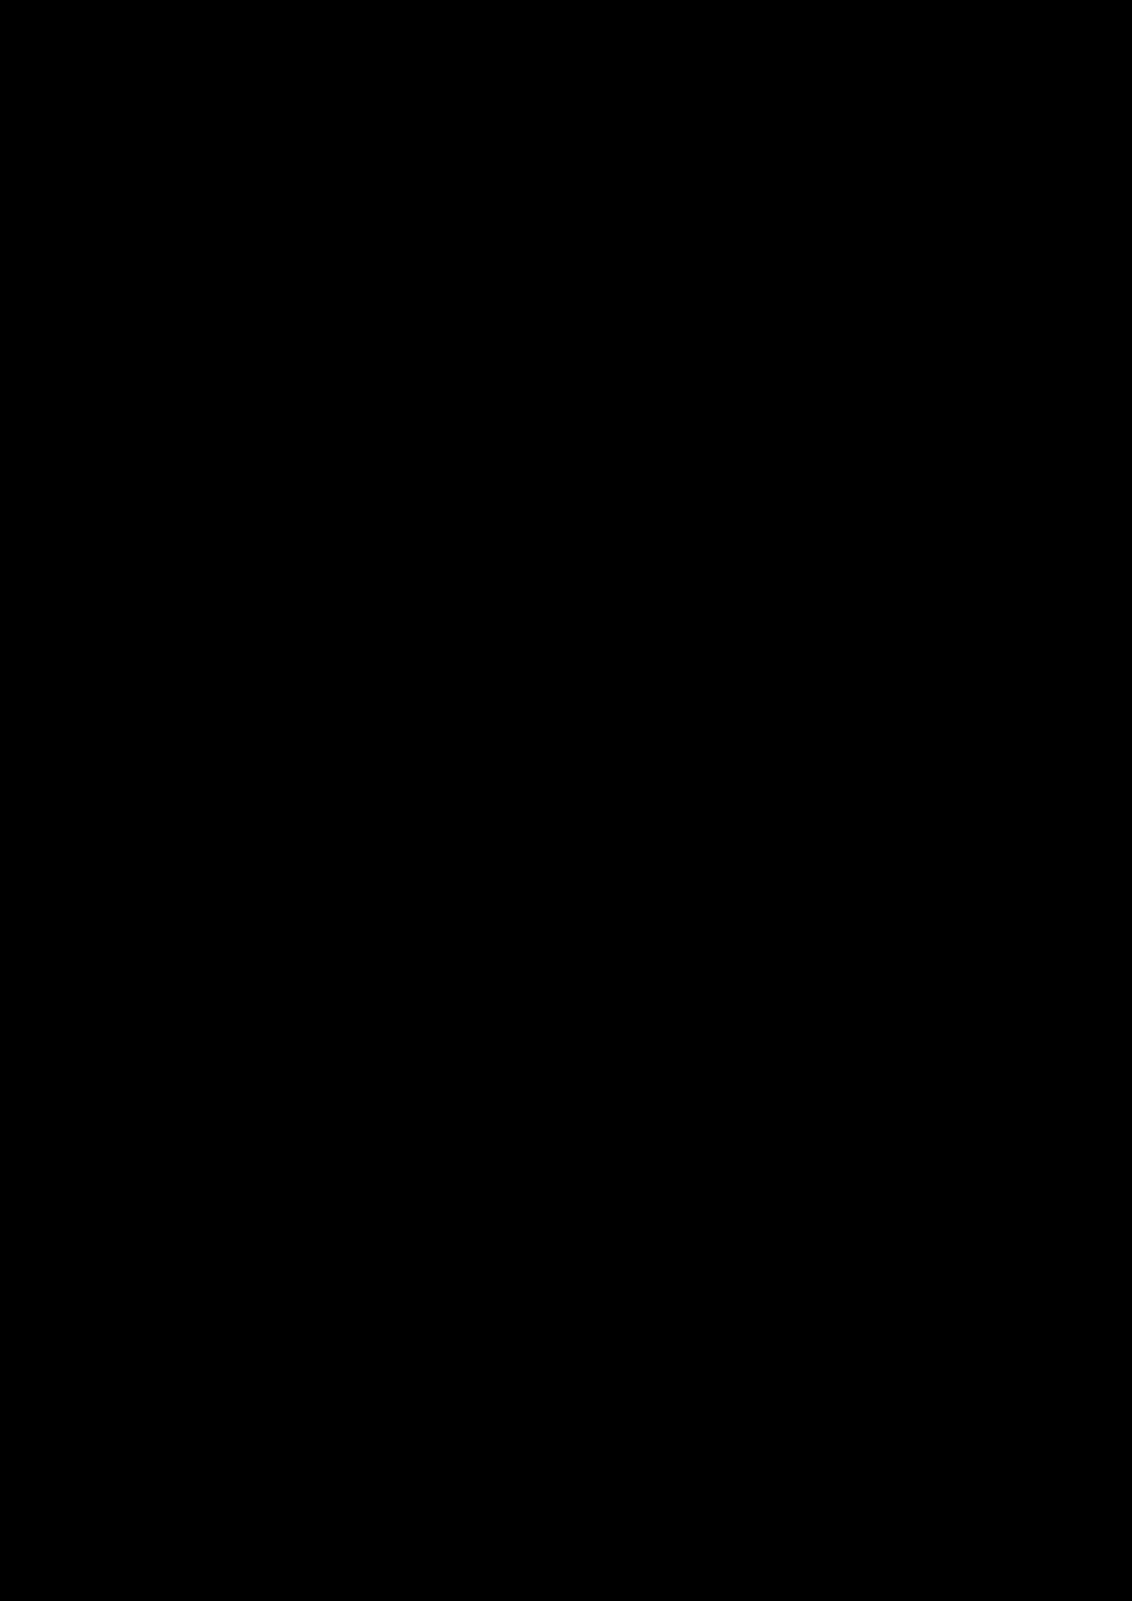 Ispoved Pervogo Boga slide, Image 45